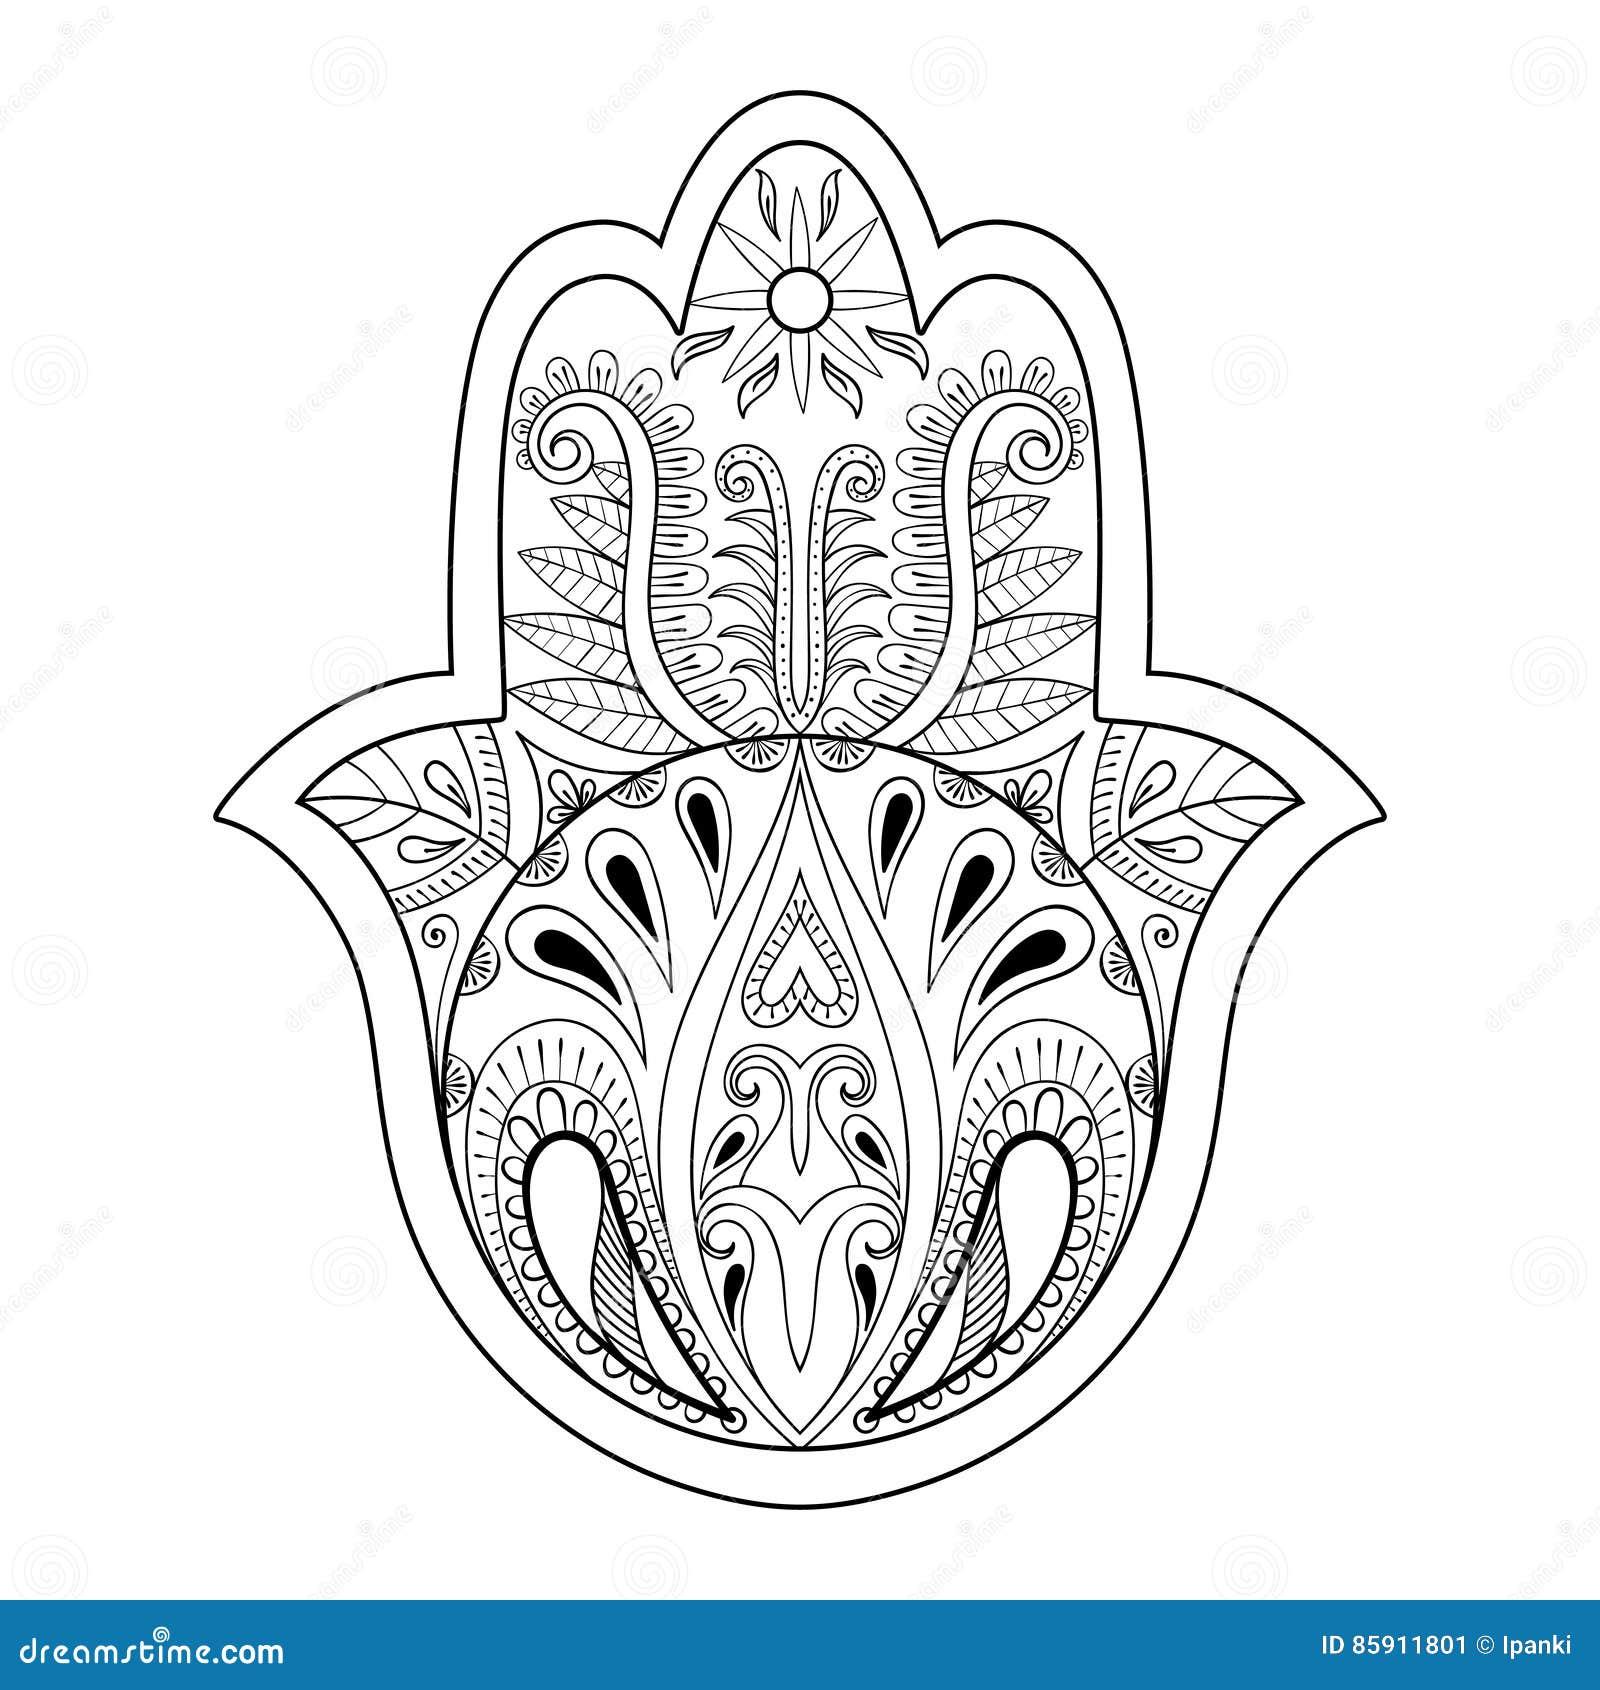 1e2dedff9 Hamsa hand vector illustration. Hand drawn symbol of prayer for adult anti  stress coloring book, page in zentangle style. Blackwork yoga tattoo design.